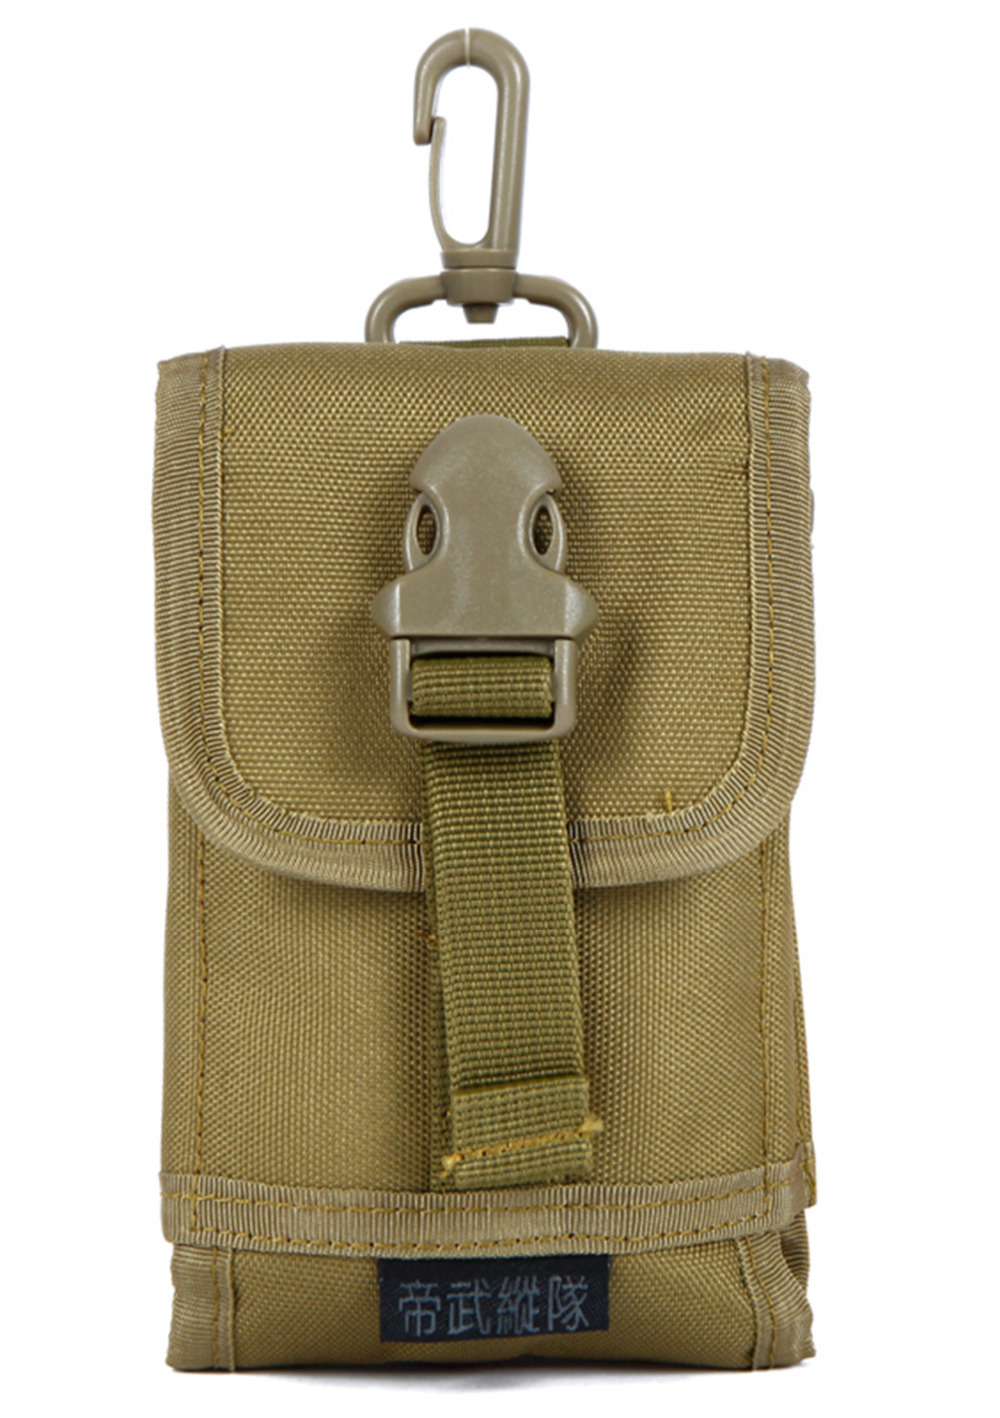 New Men 1000D Nylon Hook Cell/Mobile Phone Case Belt Hip Bum Fanny Bag Waist Pack Purse Travel Riding Bag